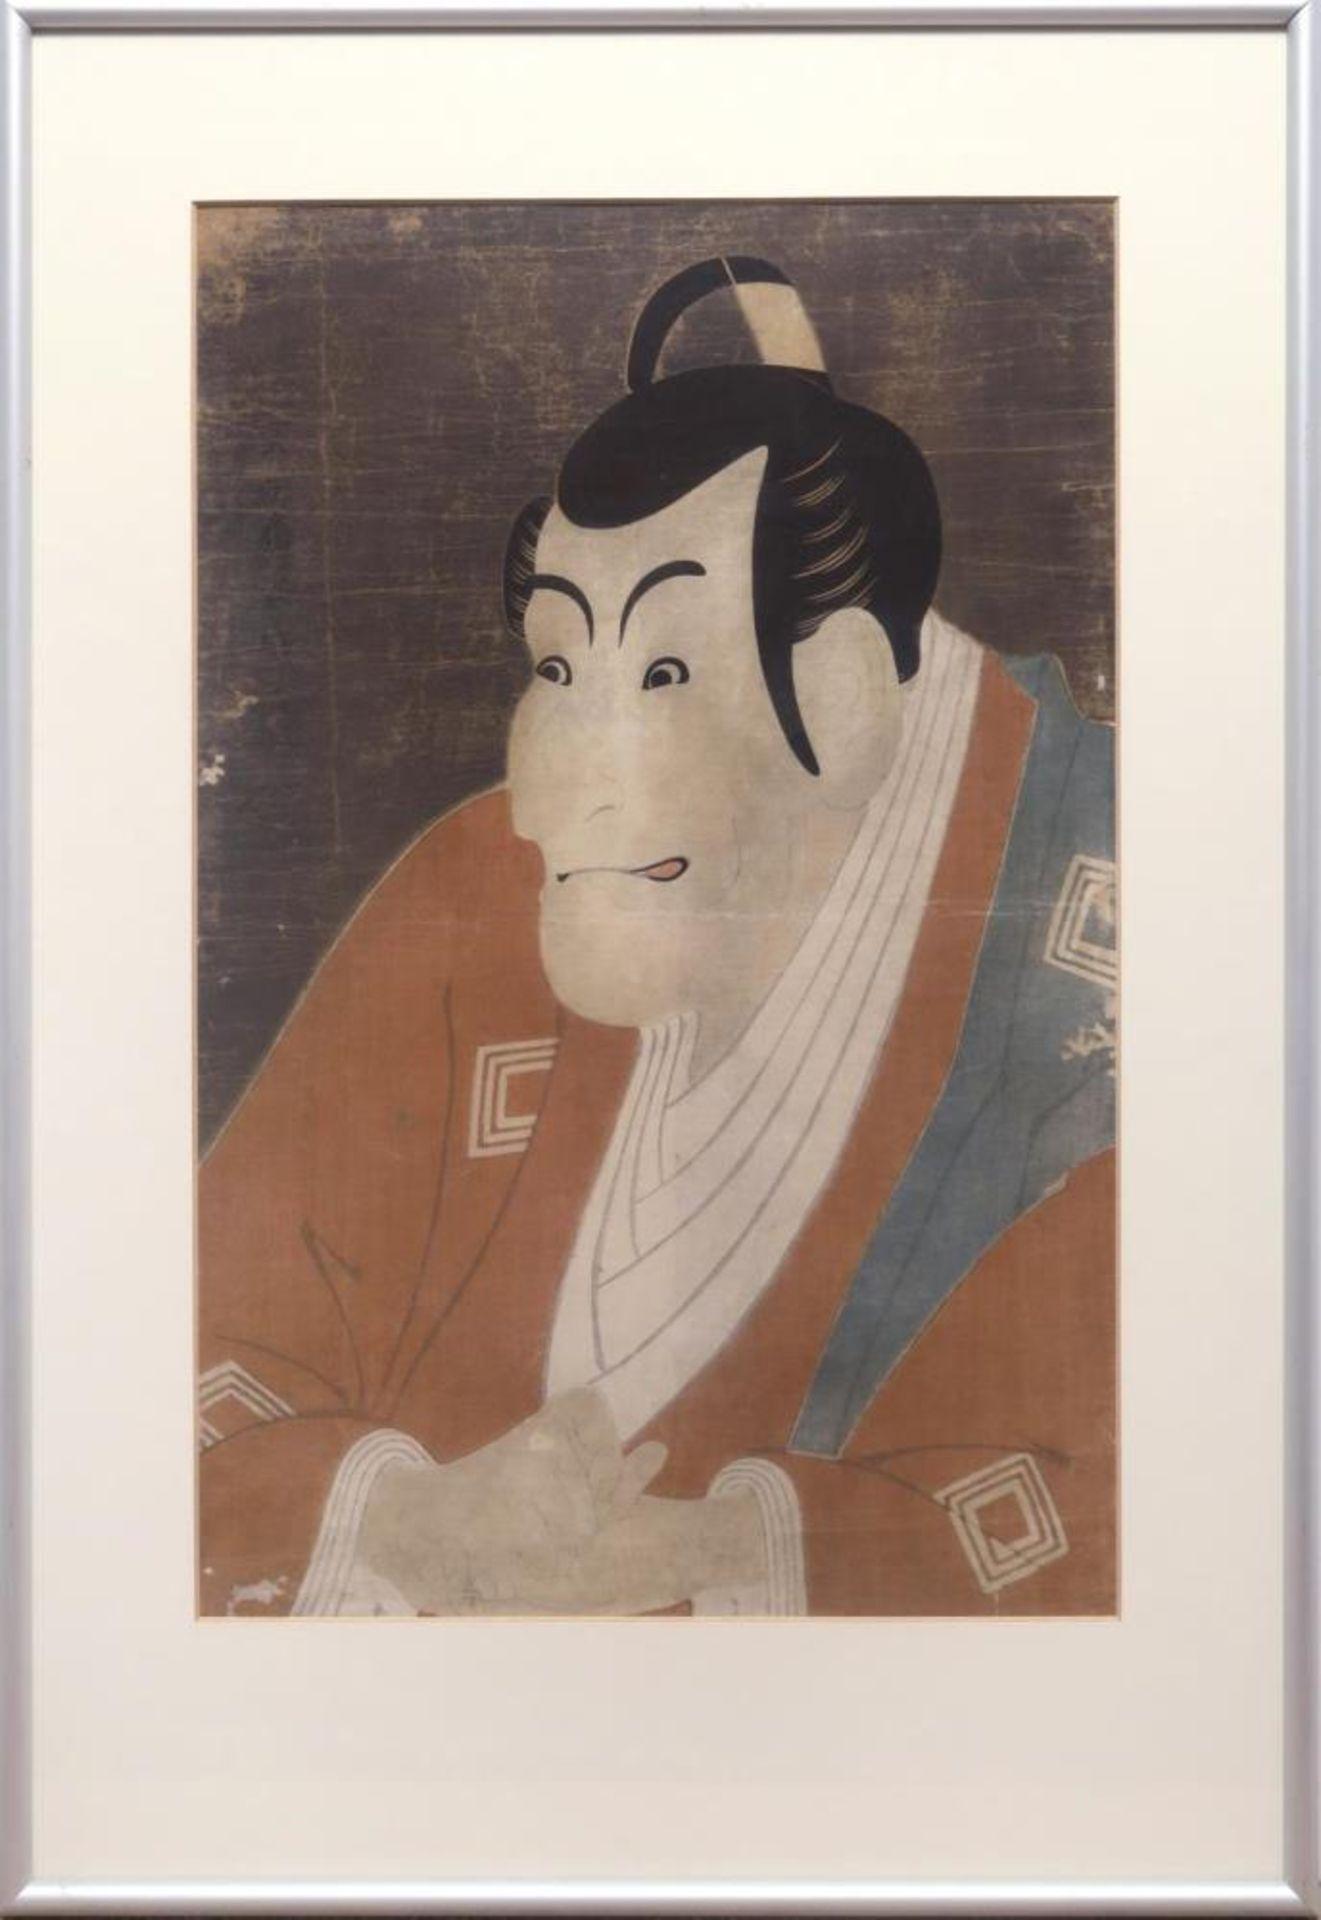 Ichikawa Ebizo IV in der Rolle des Takemura Sadanoshin